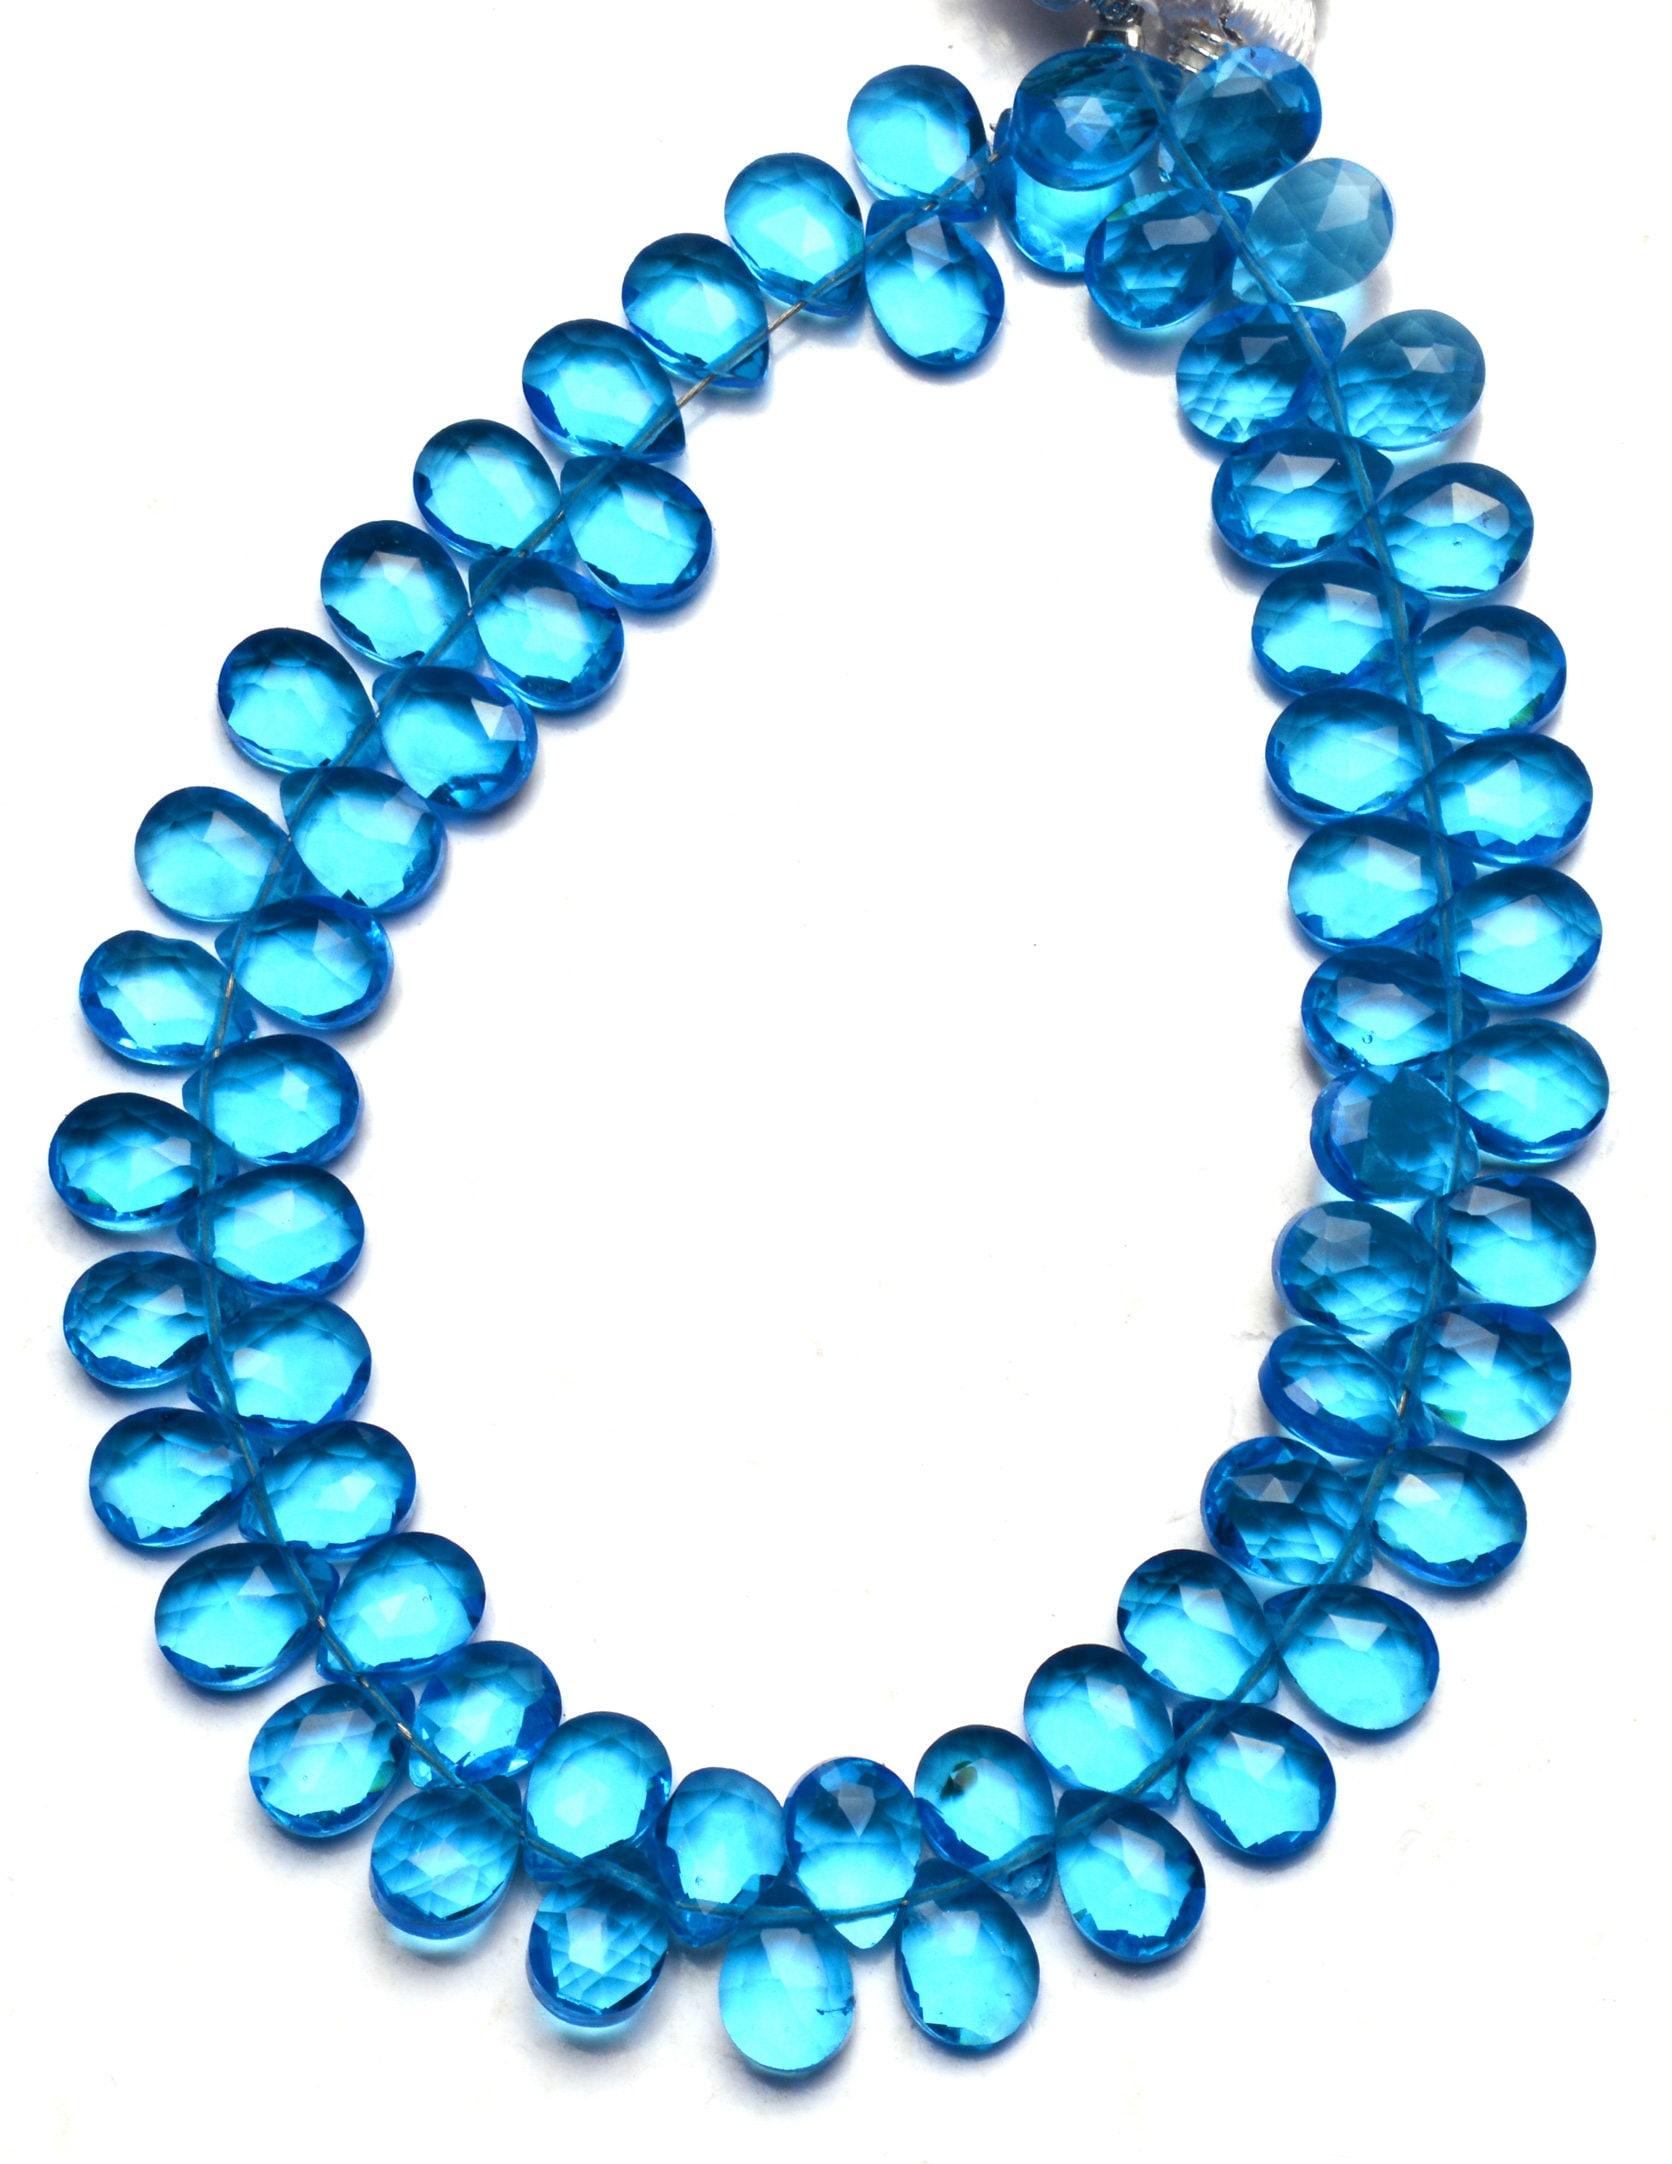 Swiss Blue Topaz Color Hydro Quartz Faceted 10x7mm Approx Size Teardrop Shape Briolette Beads 8 Strand Dark Sky Blue Color Super Quality